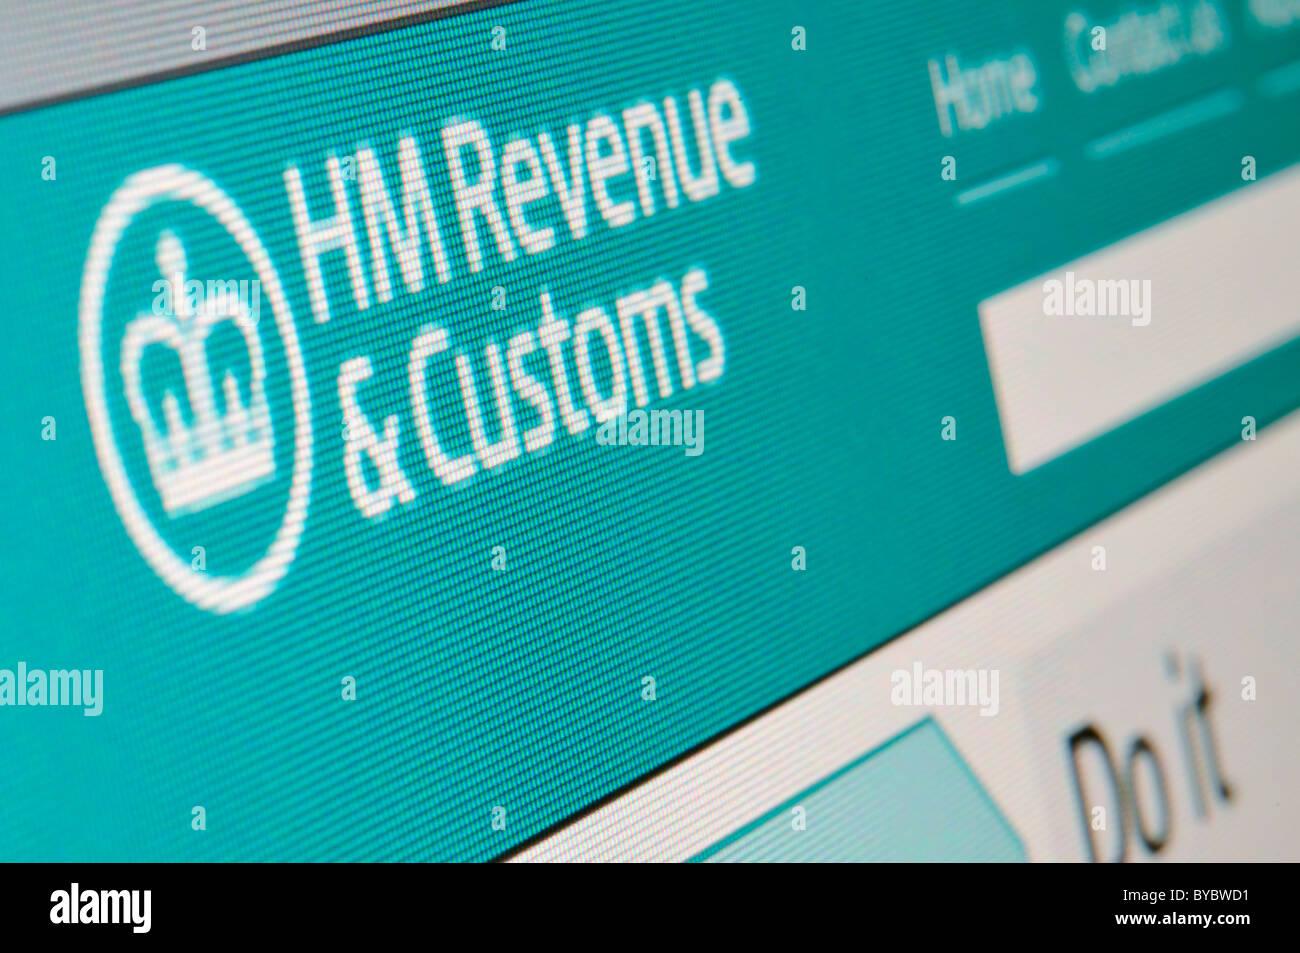 Website HM Revenue and Customs - Stock Image